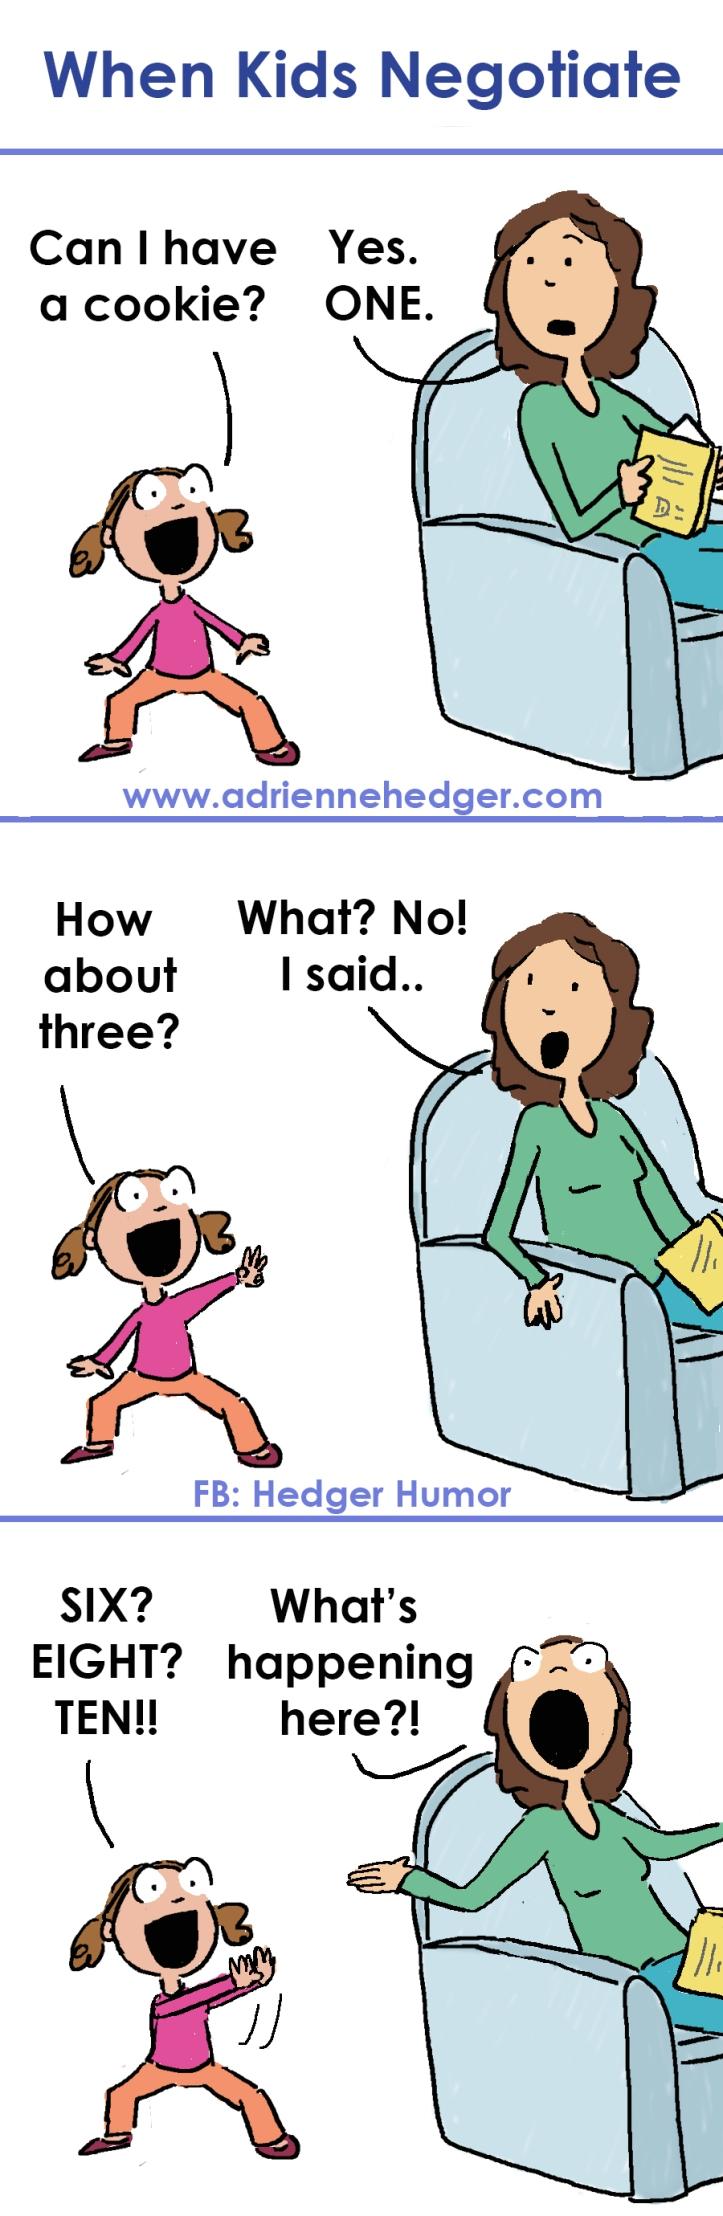 When Kids Negotiate